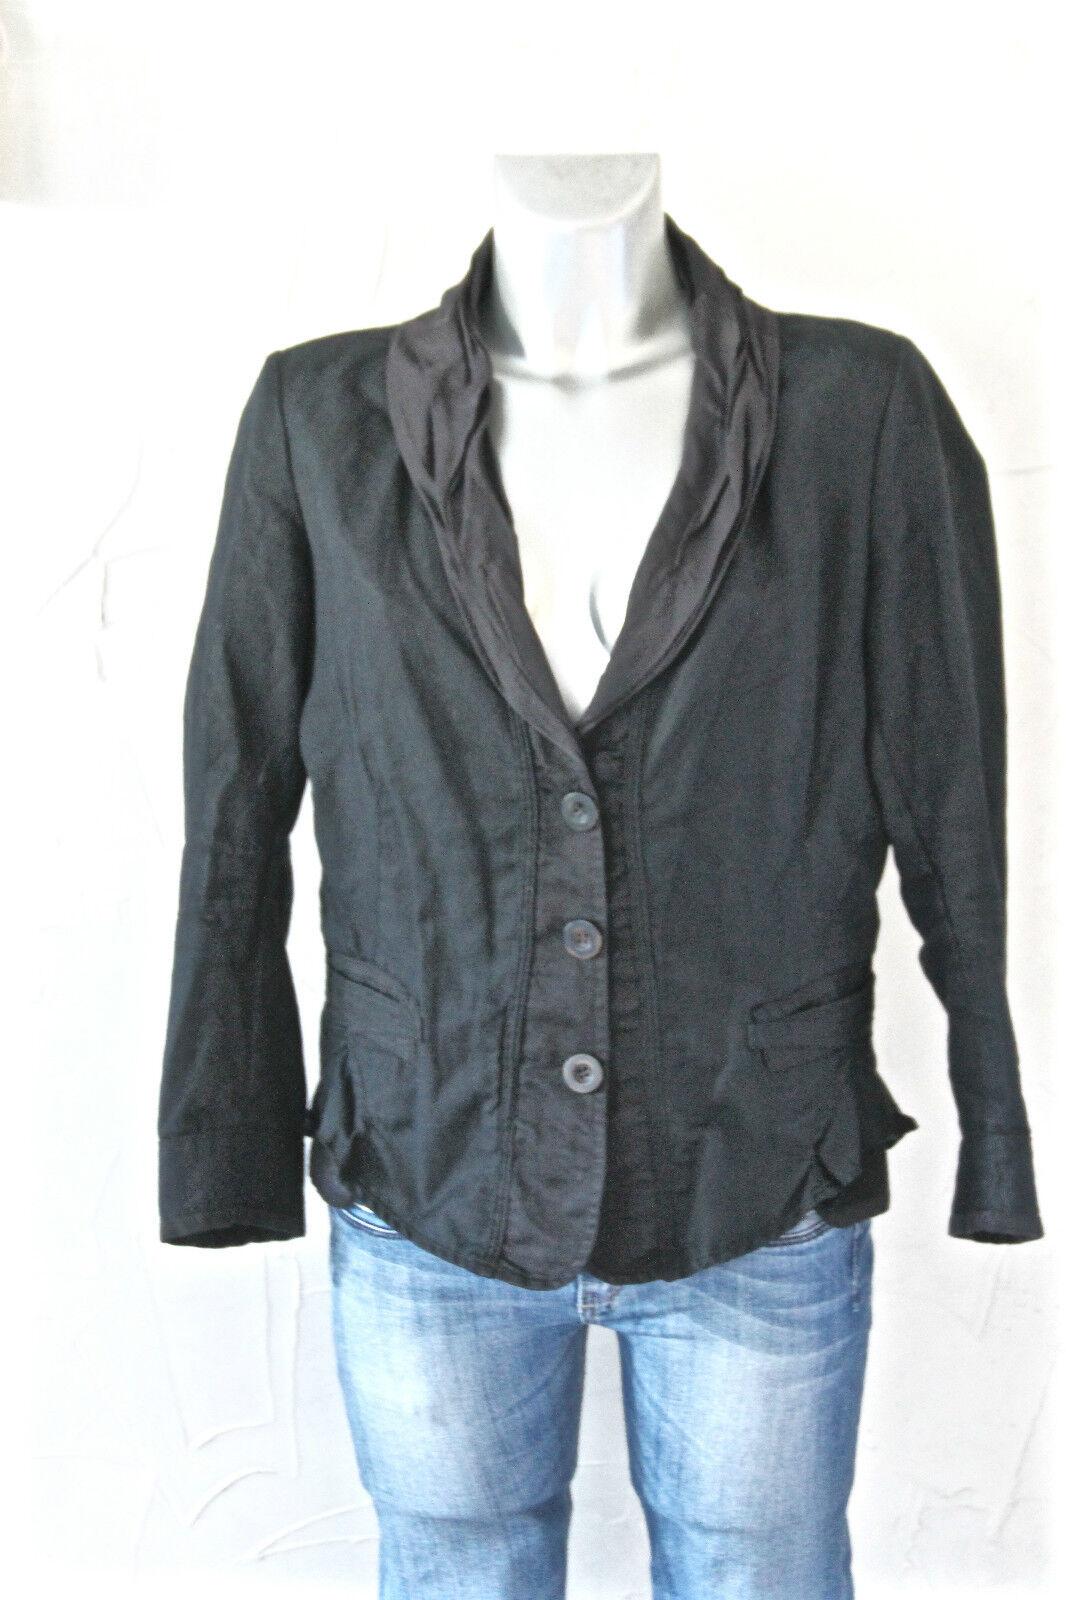 Jolie luxueuse coat veste coton lin blacke MARITHÉ FRANCOIS GIRBAUD size 42